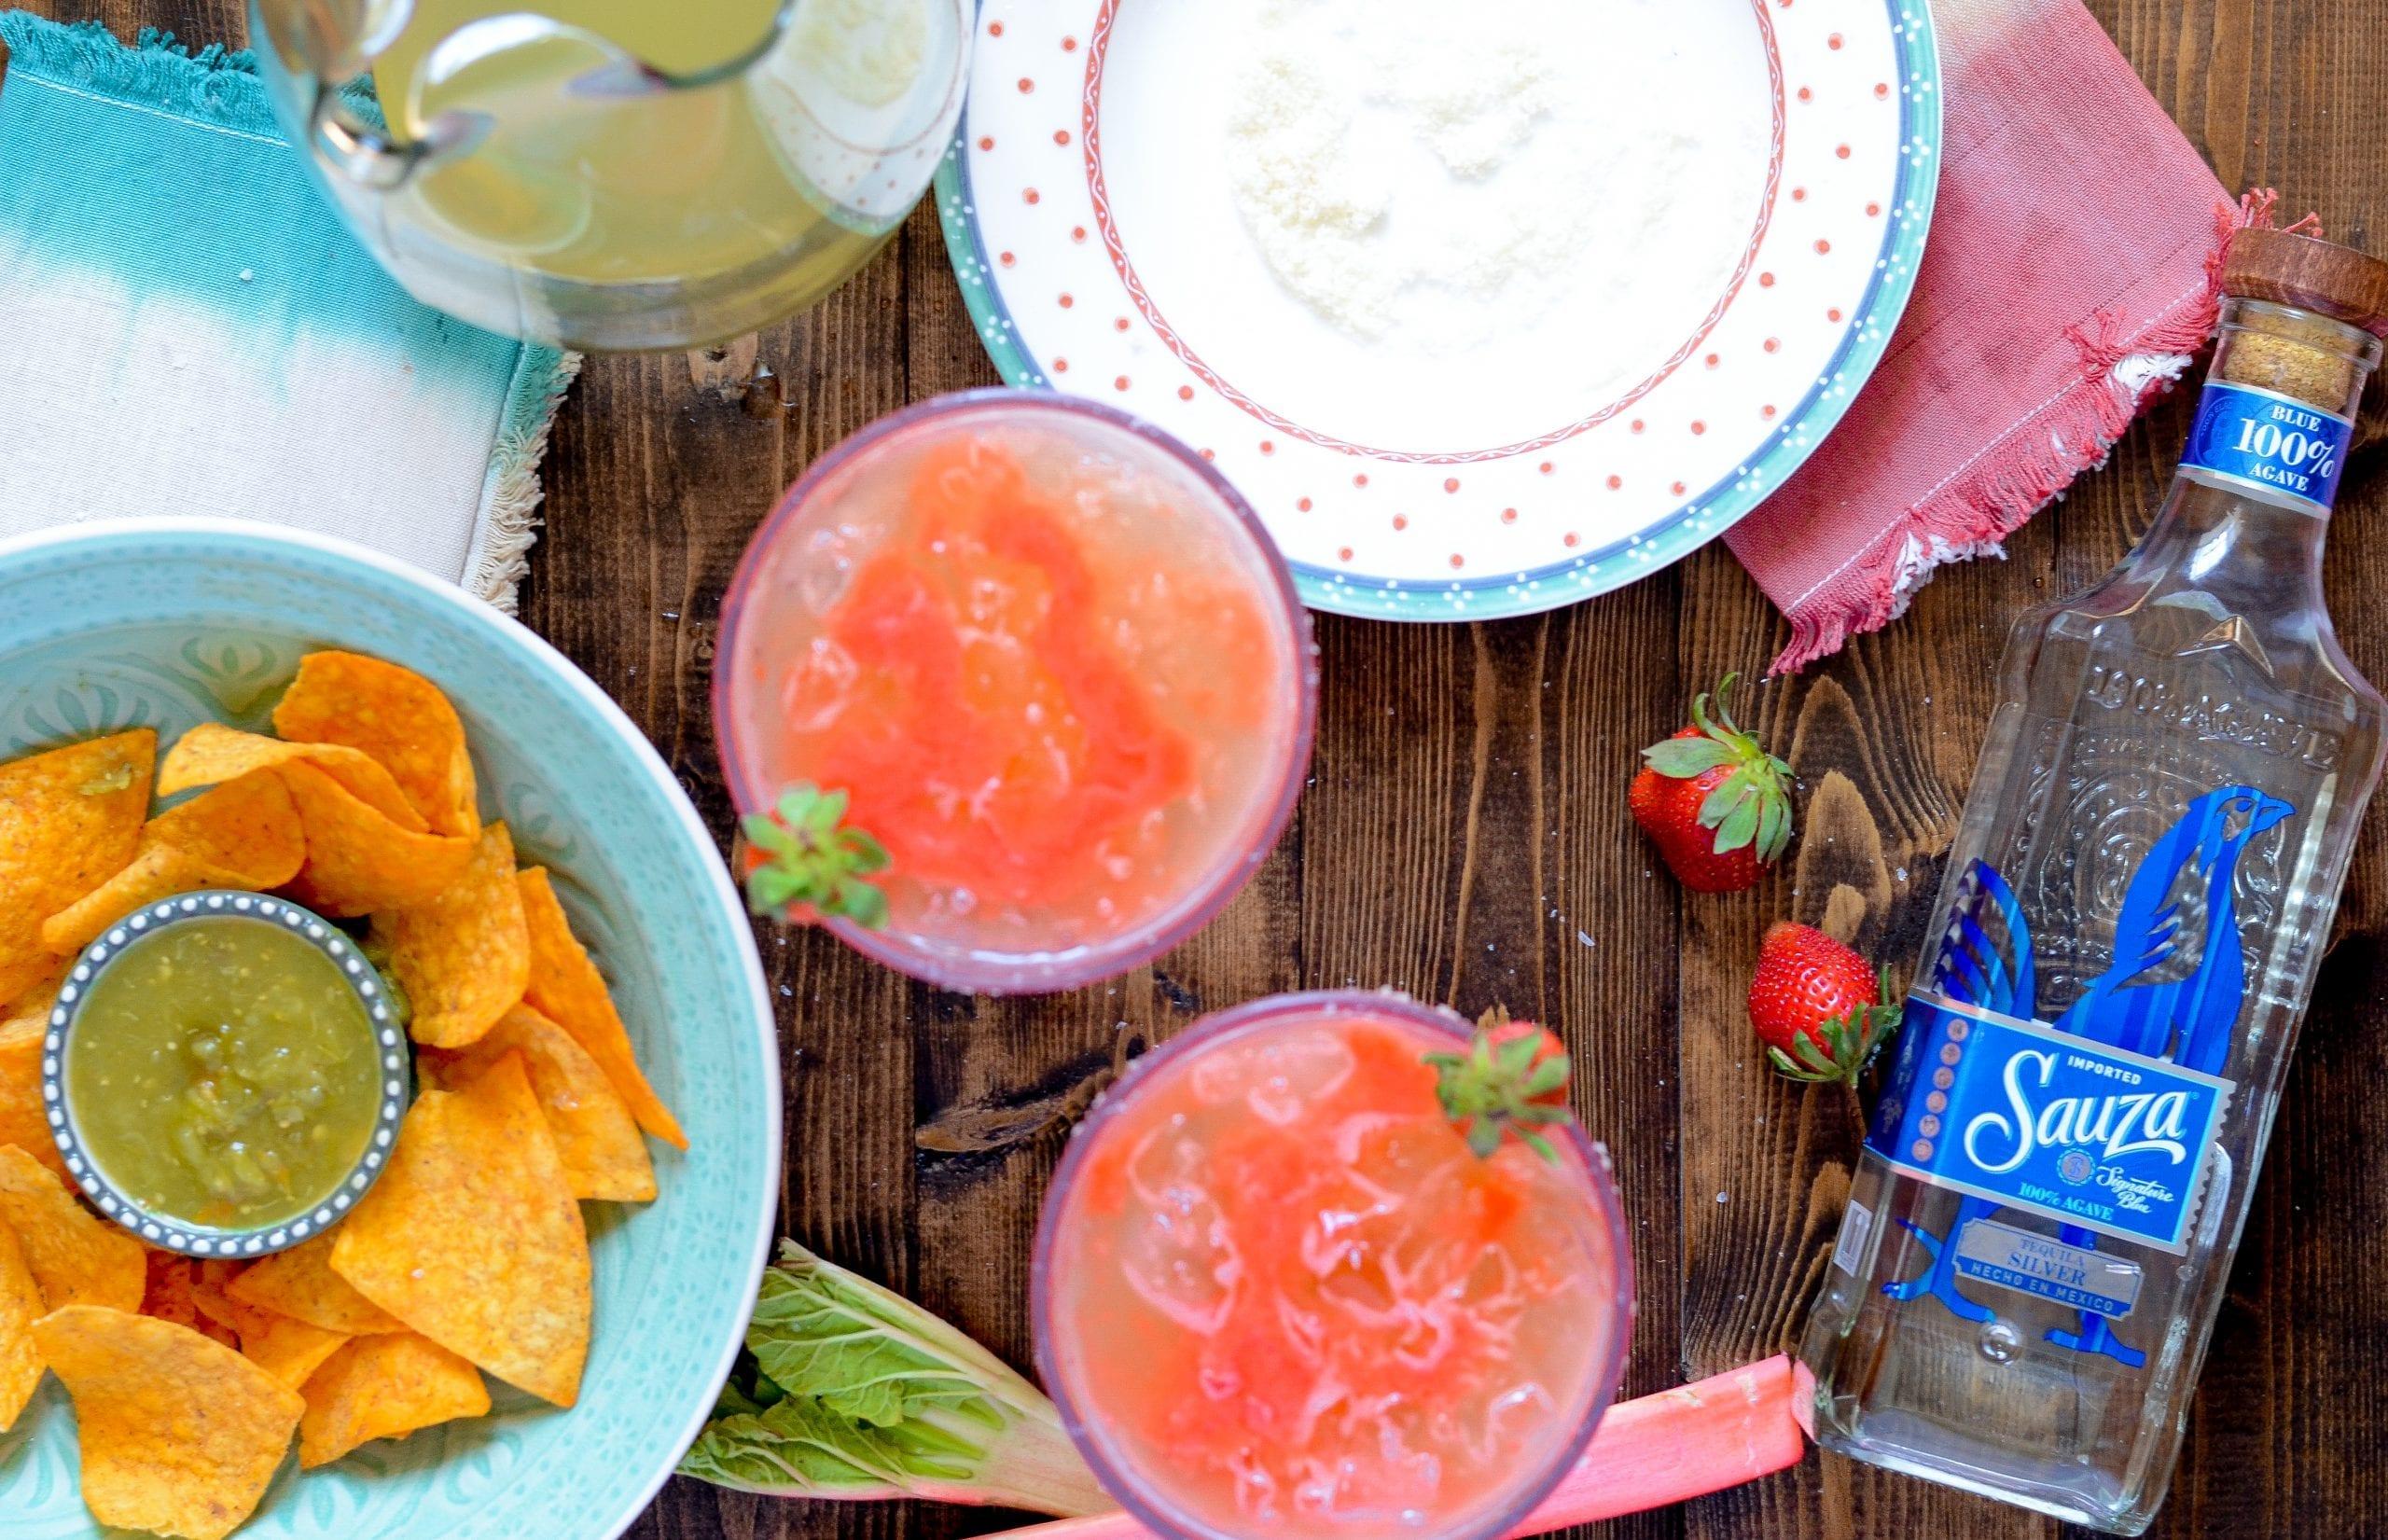 Sauza® Classic Margaritas with Strawberry Rhubarb Puree